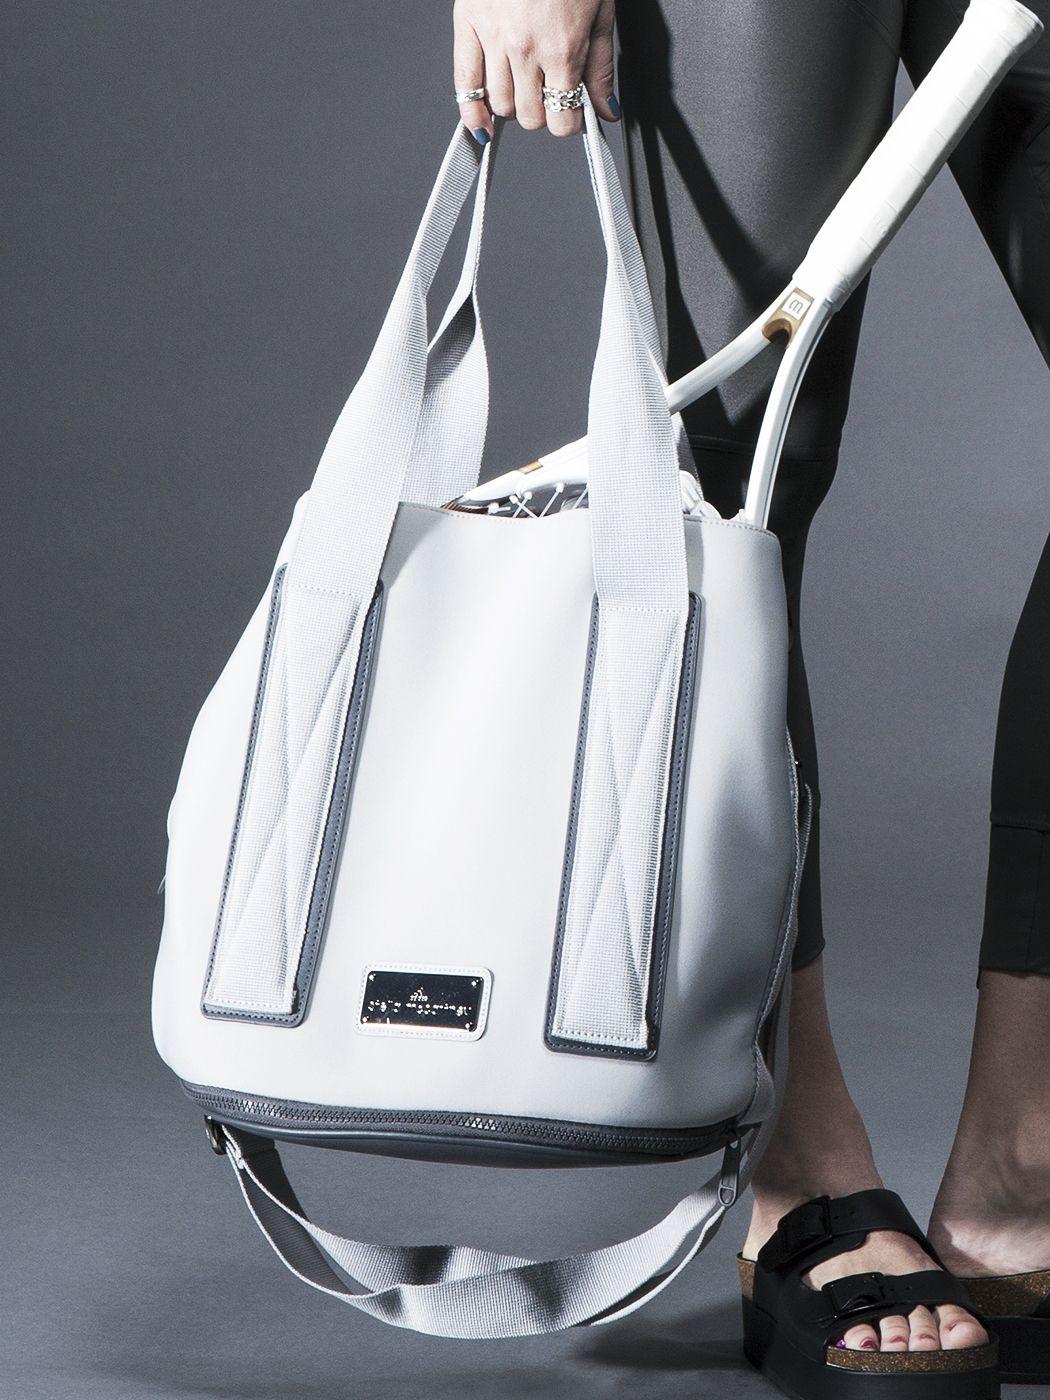 Tennis Bag - Adidas–Stella McCartney - Designers